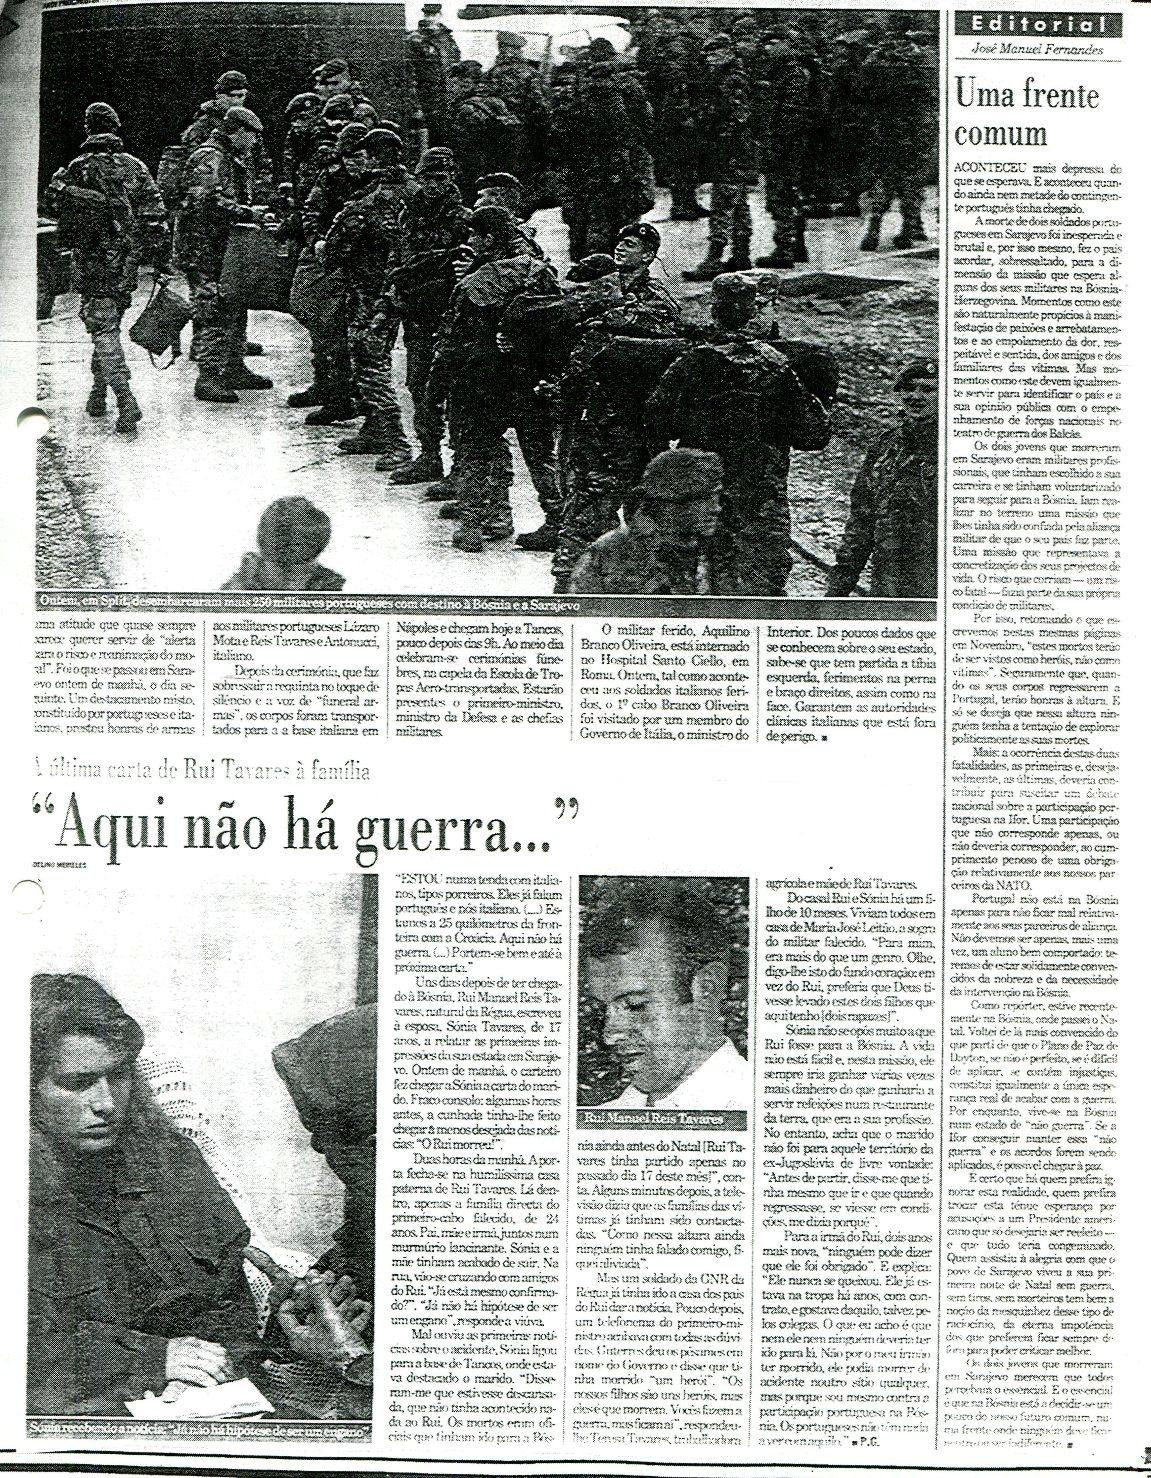 26JAN96 Público